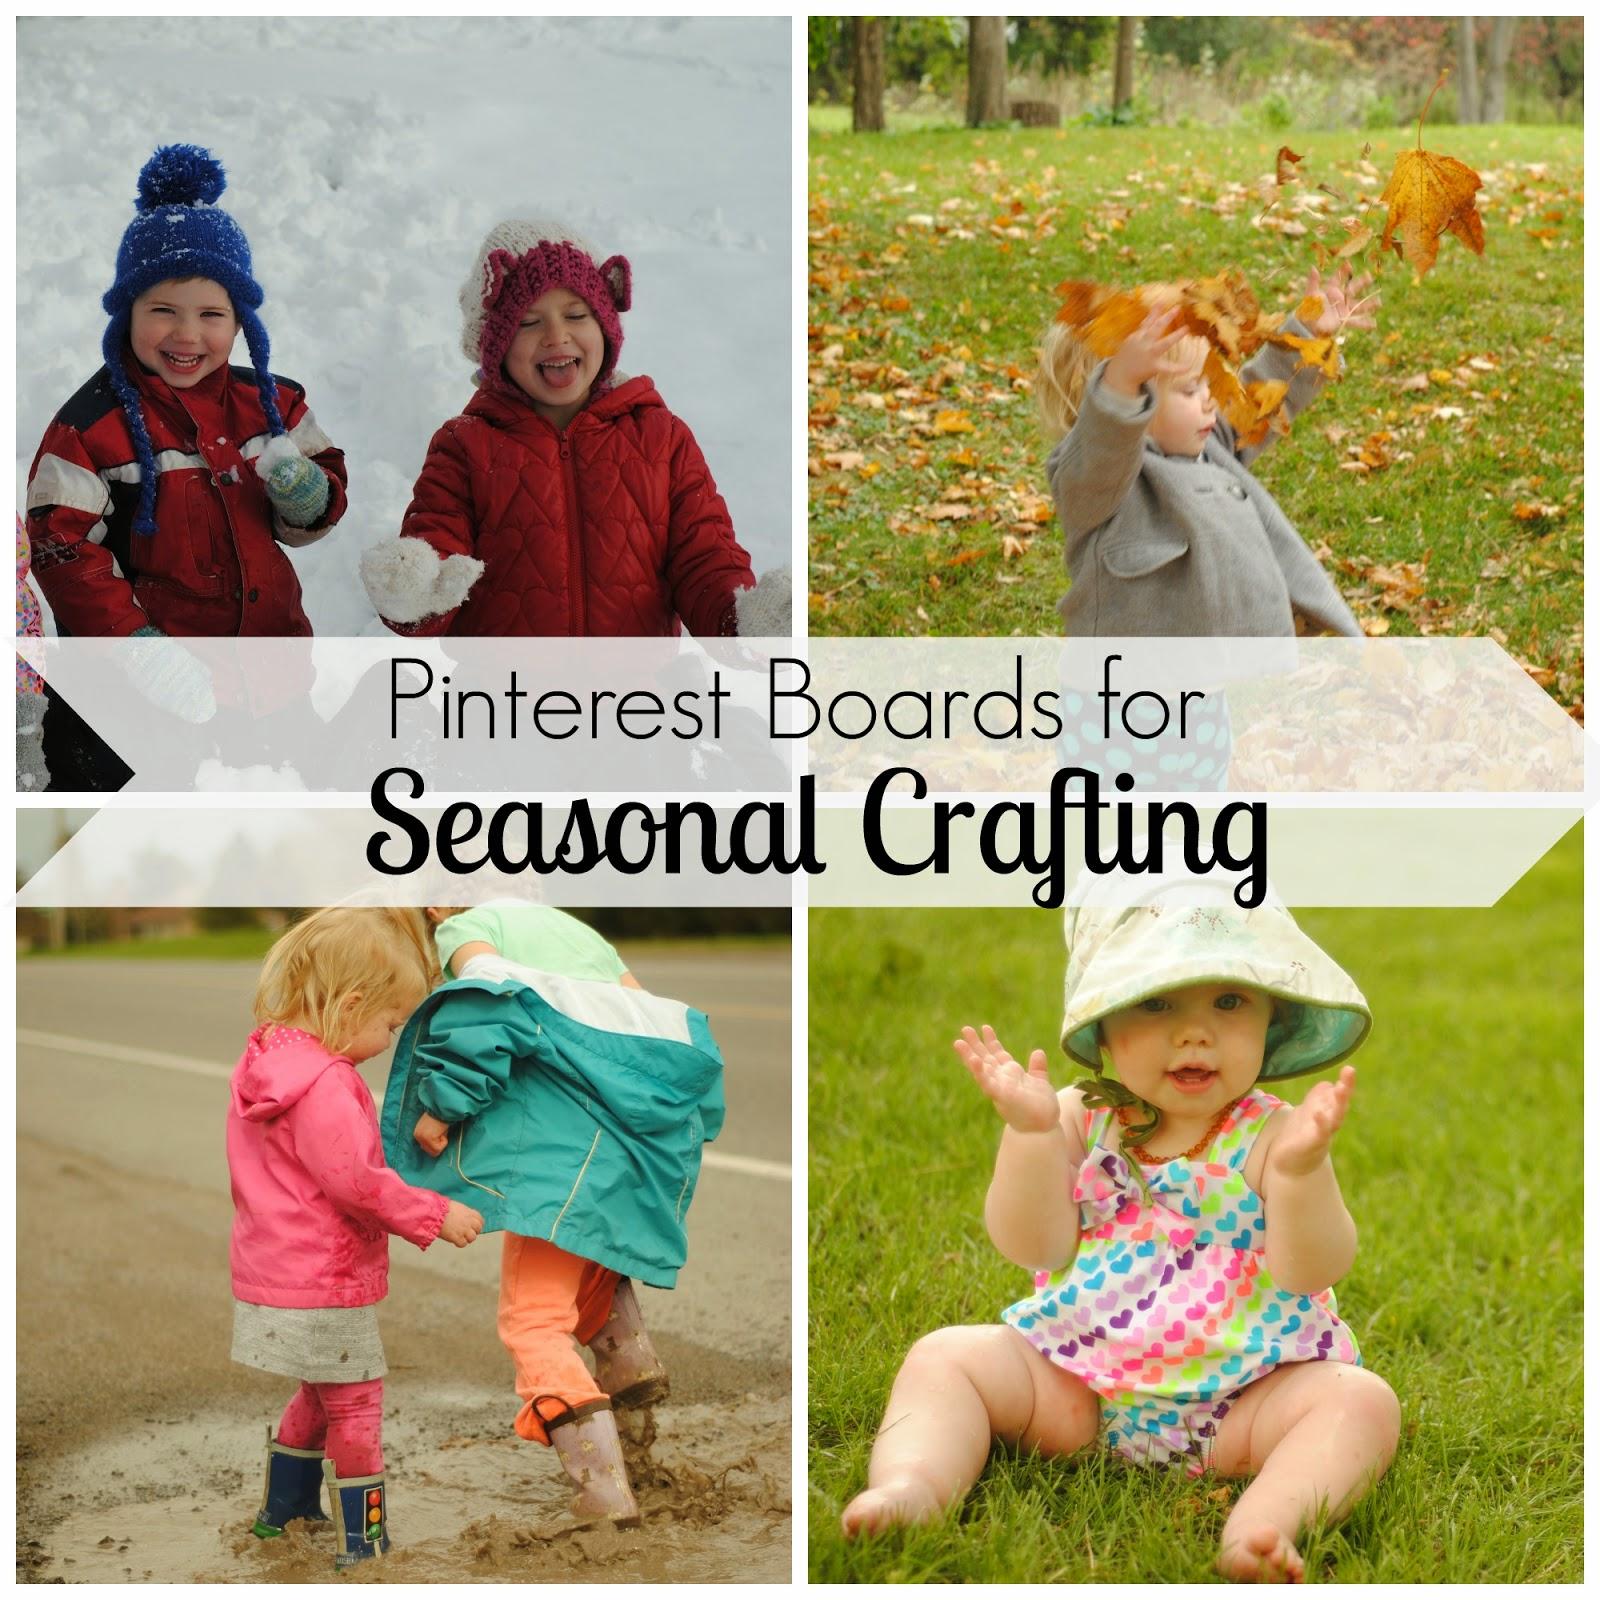 Pinterest Boards for Seasonal Crafting